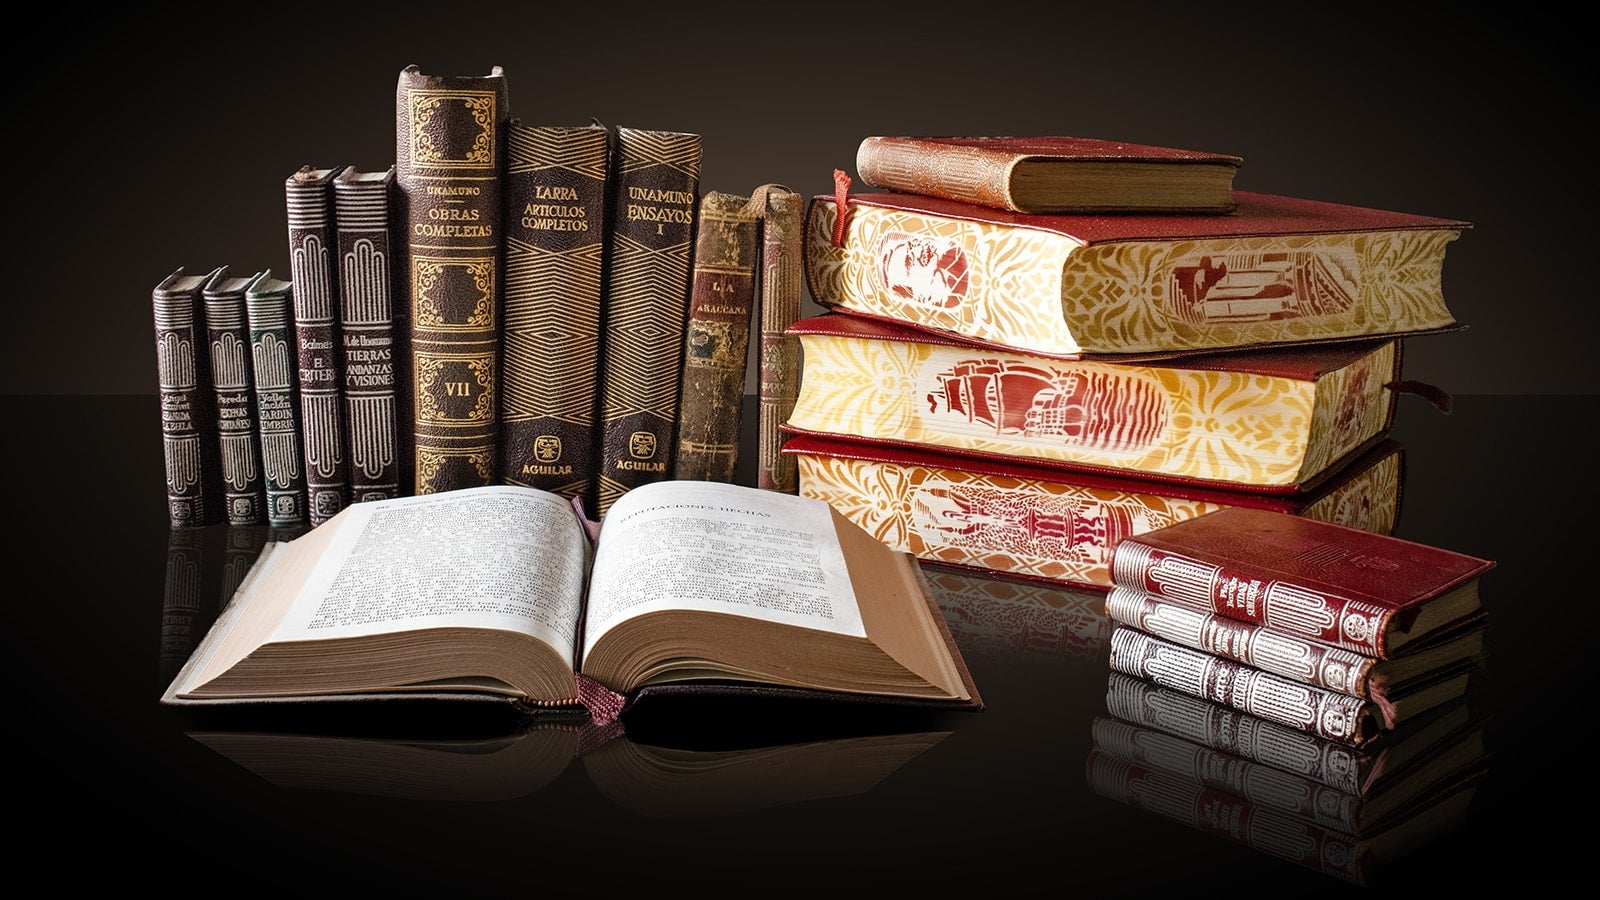 Old hardback leather bound books on a black table